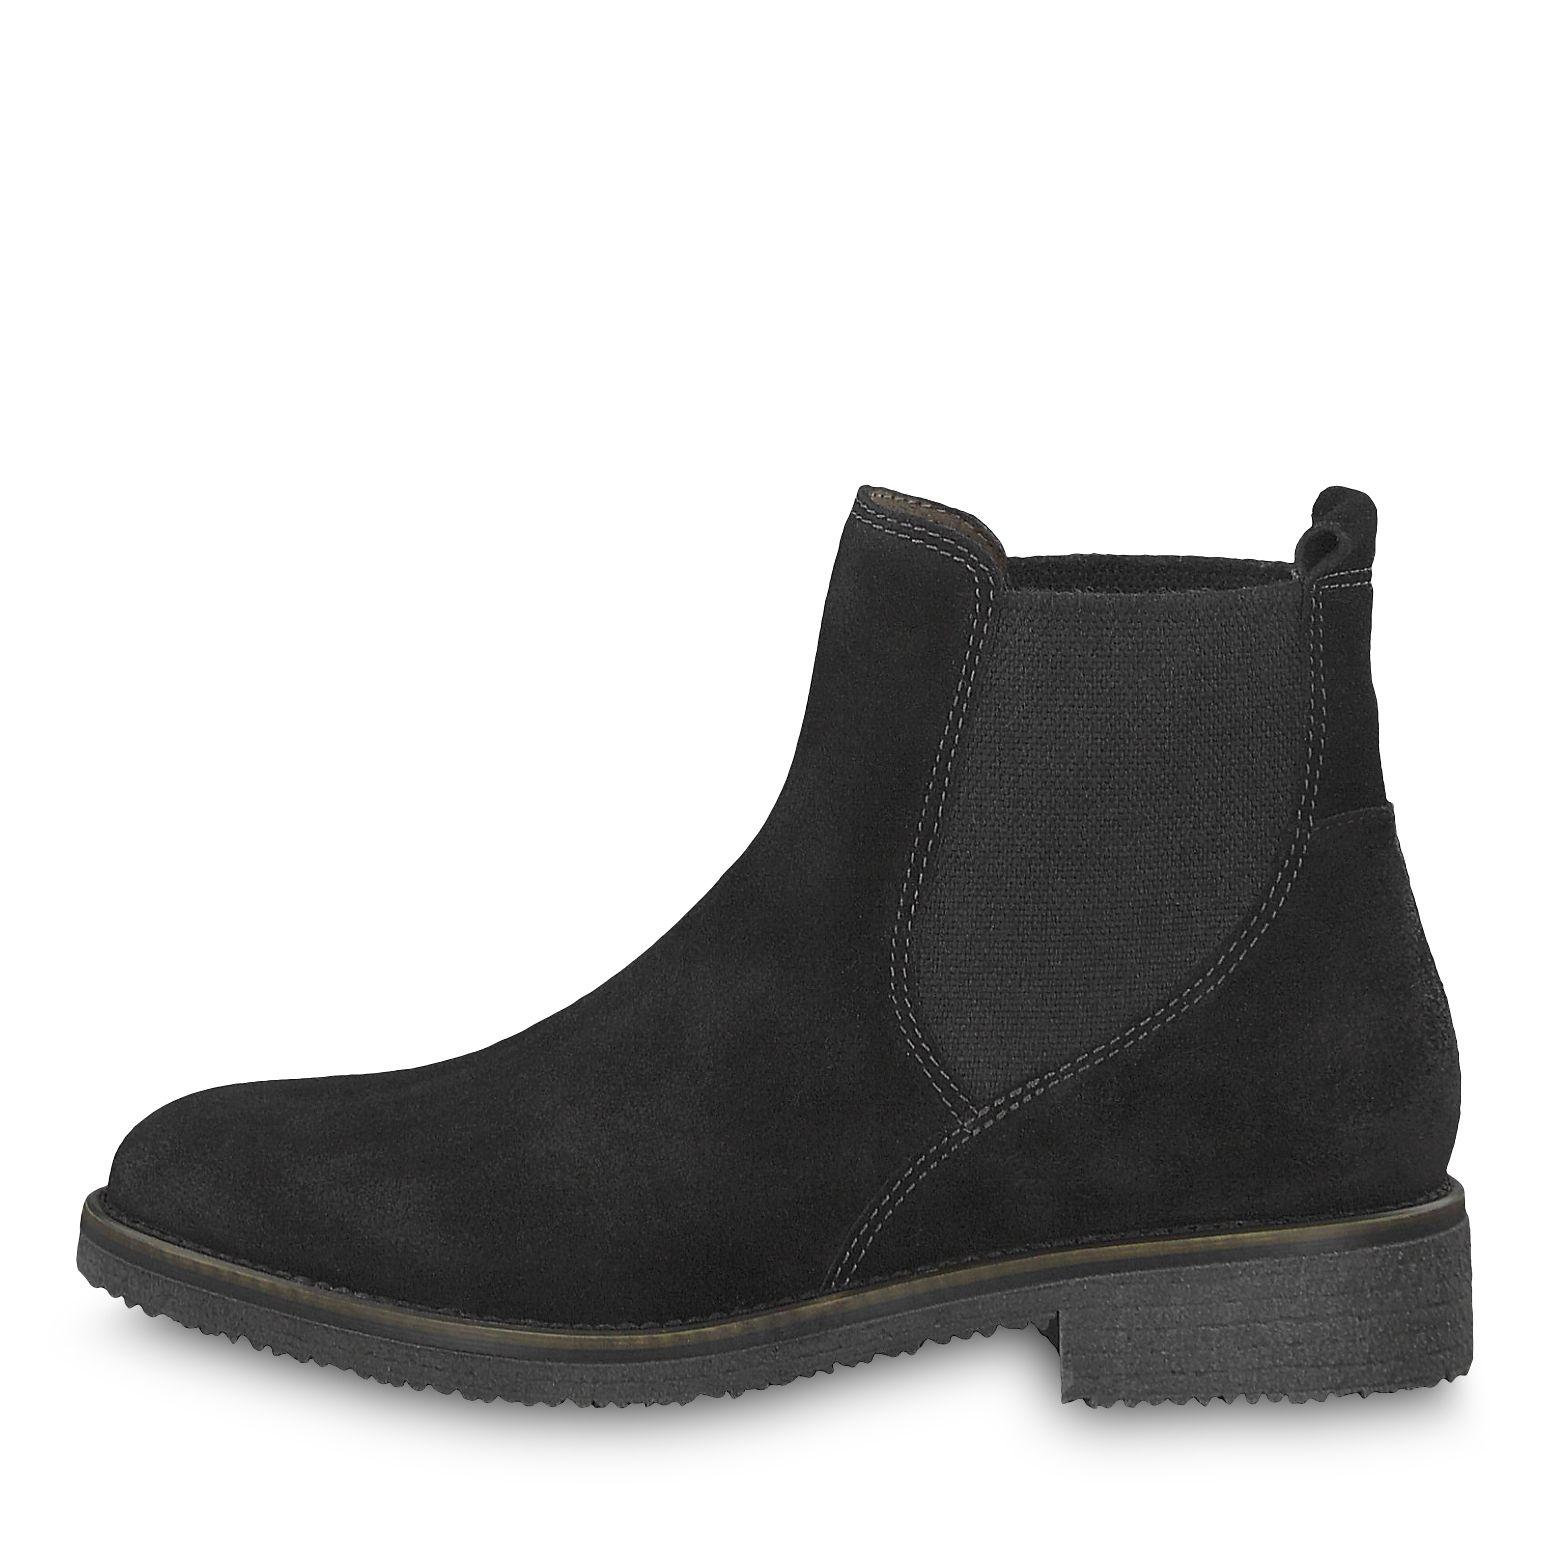 phania 1 1 25446 29 buy tamaris chelsea boots online. Black Bedroom Furniture Sets. Home Design Ideas